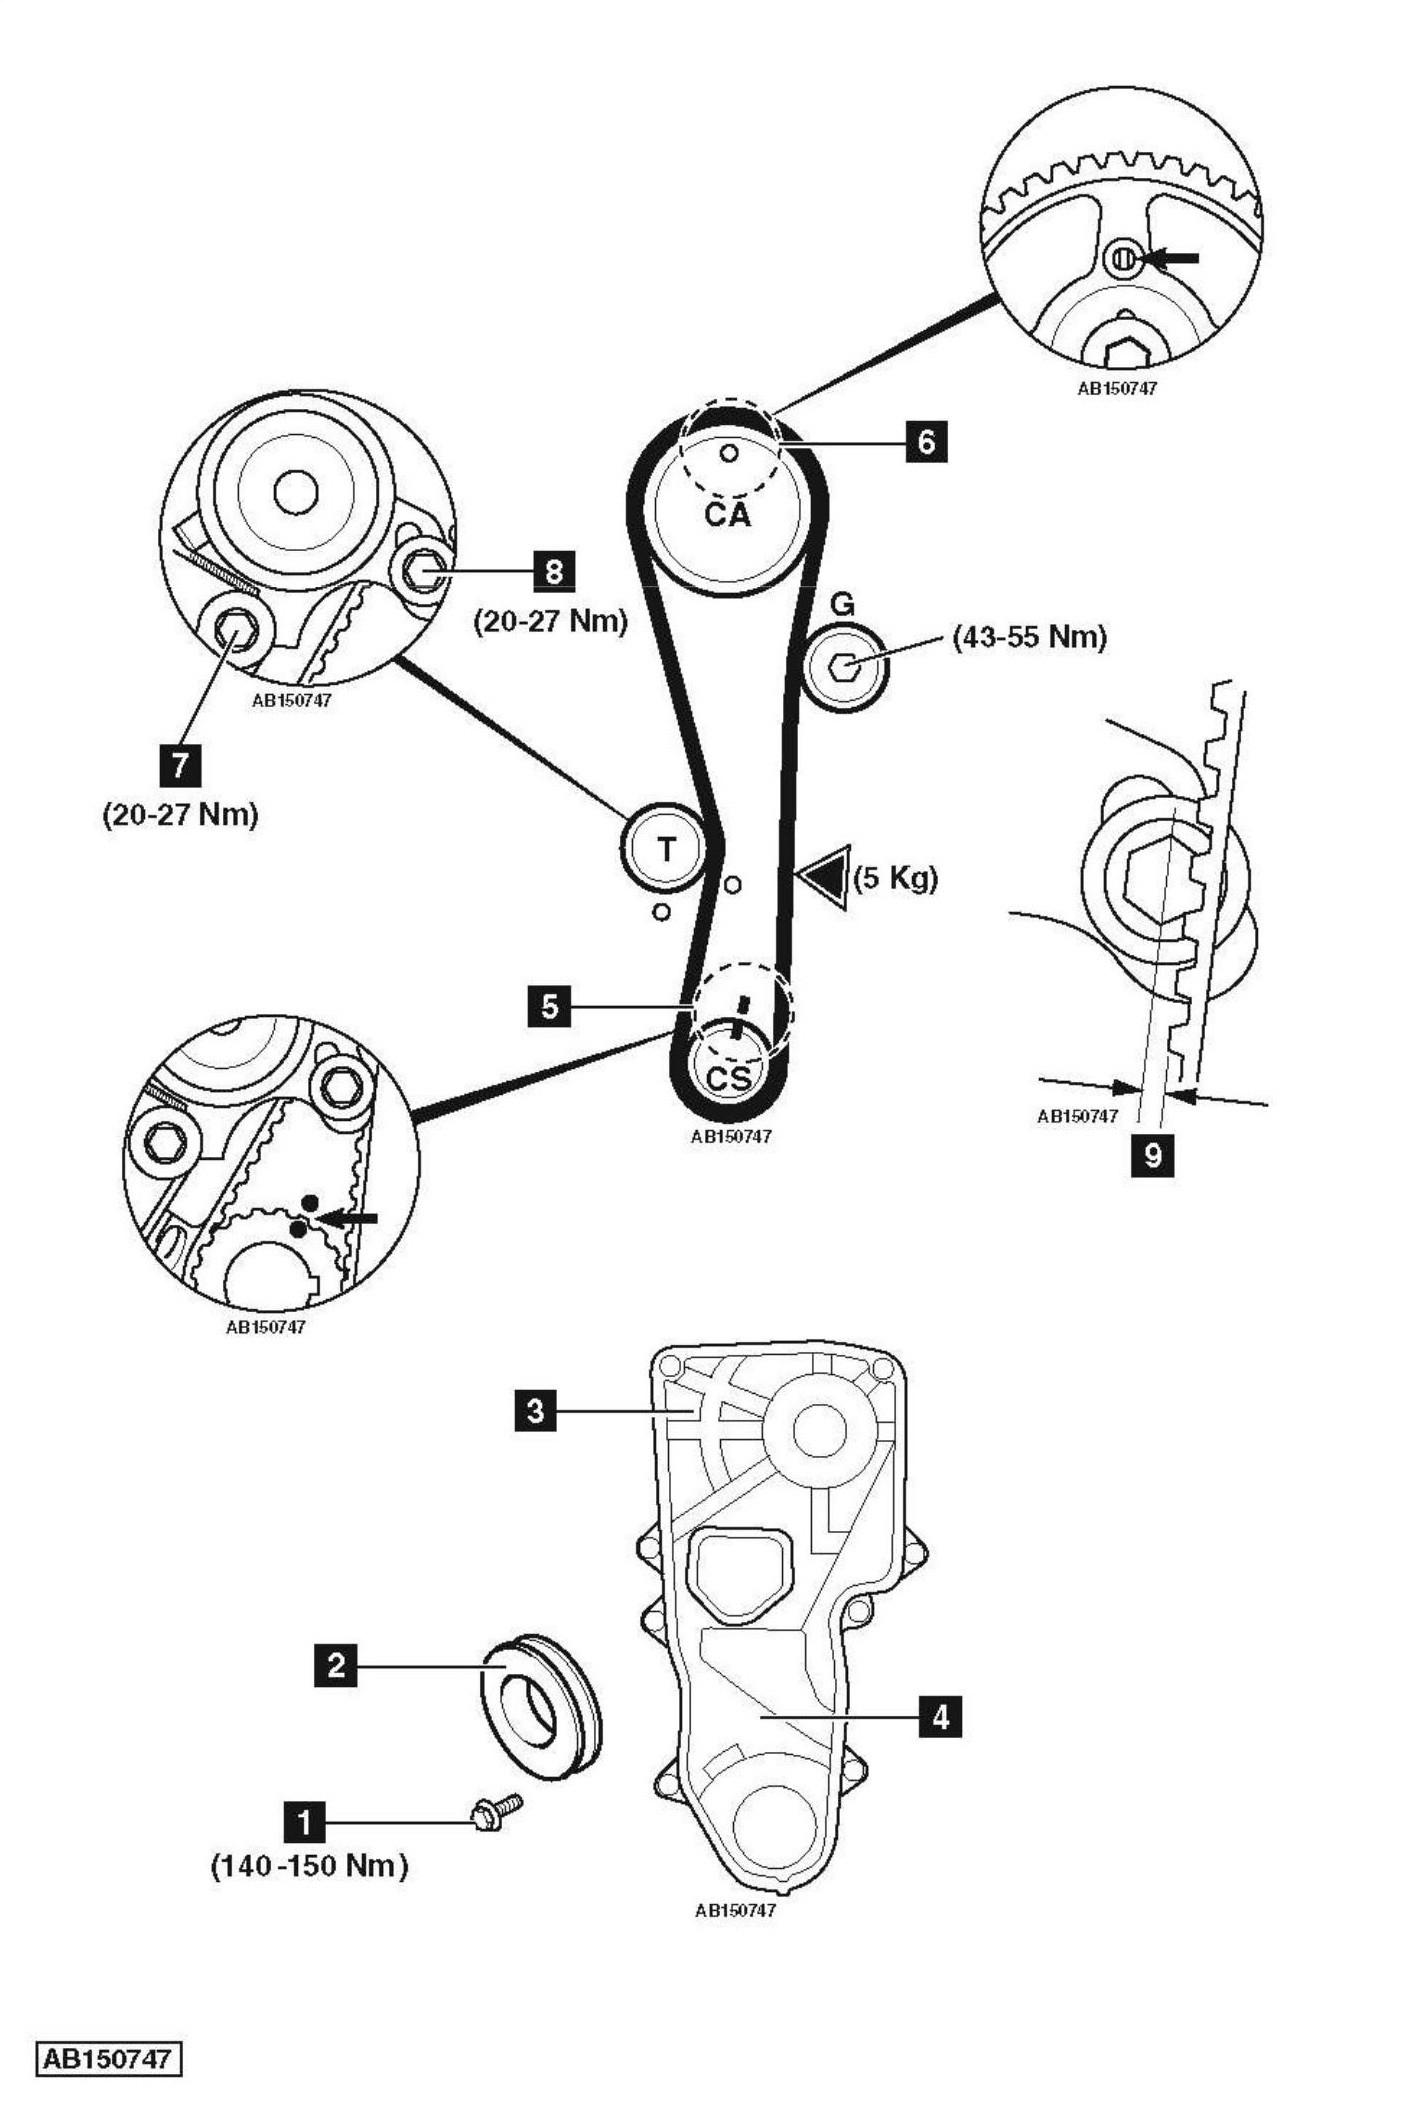 Engine Timing Diagram Car Hyundai Santa Fe Engine Belt Diagram Hyundai Getz Timing Marks